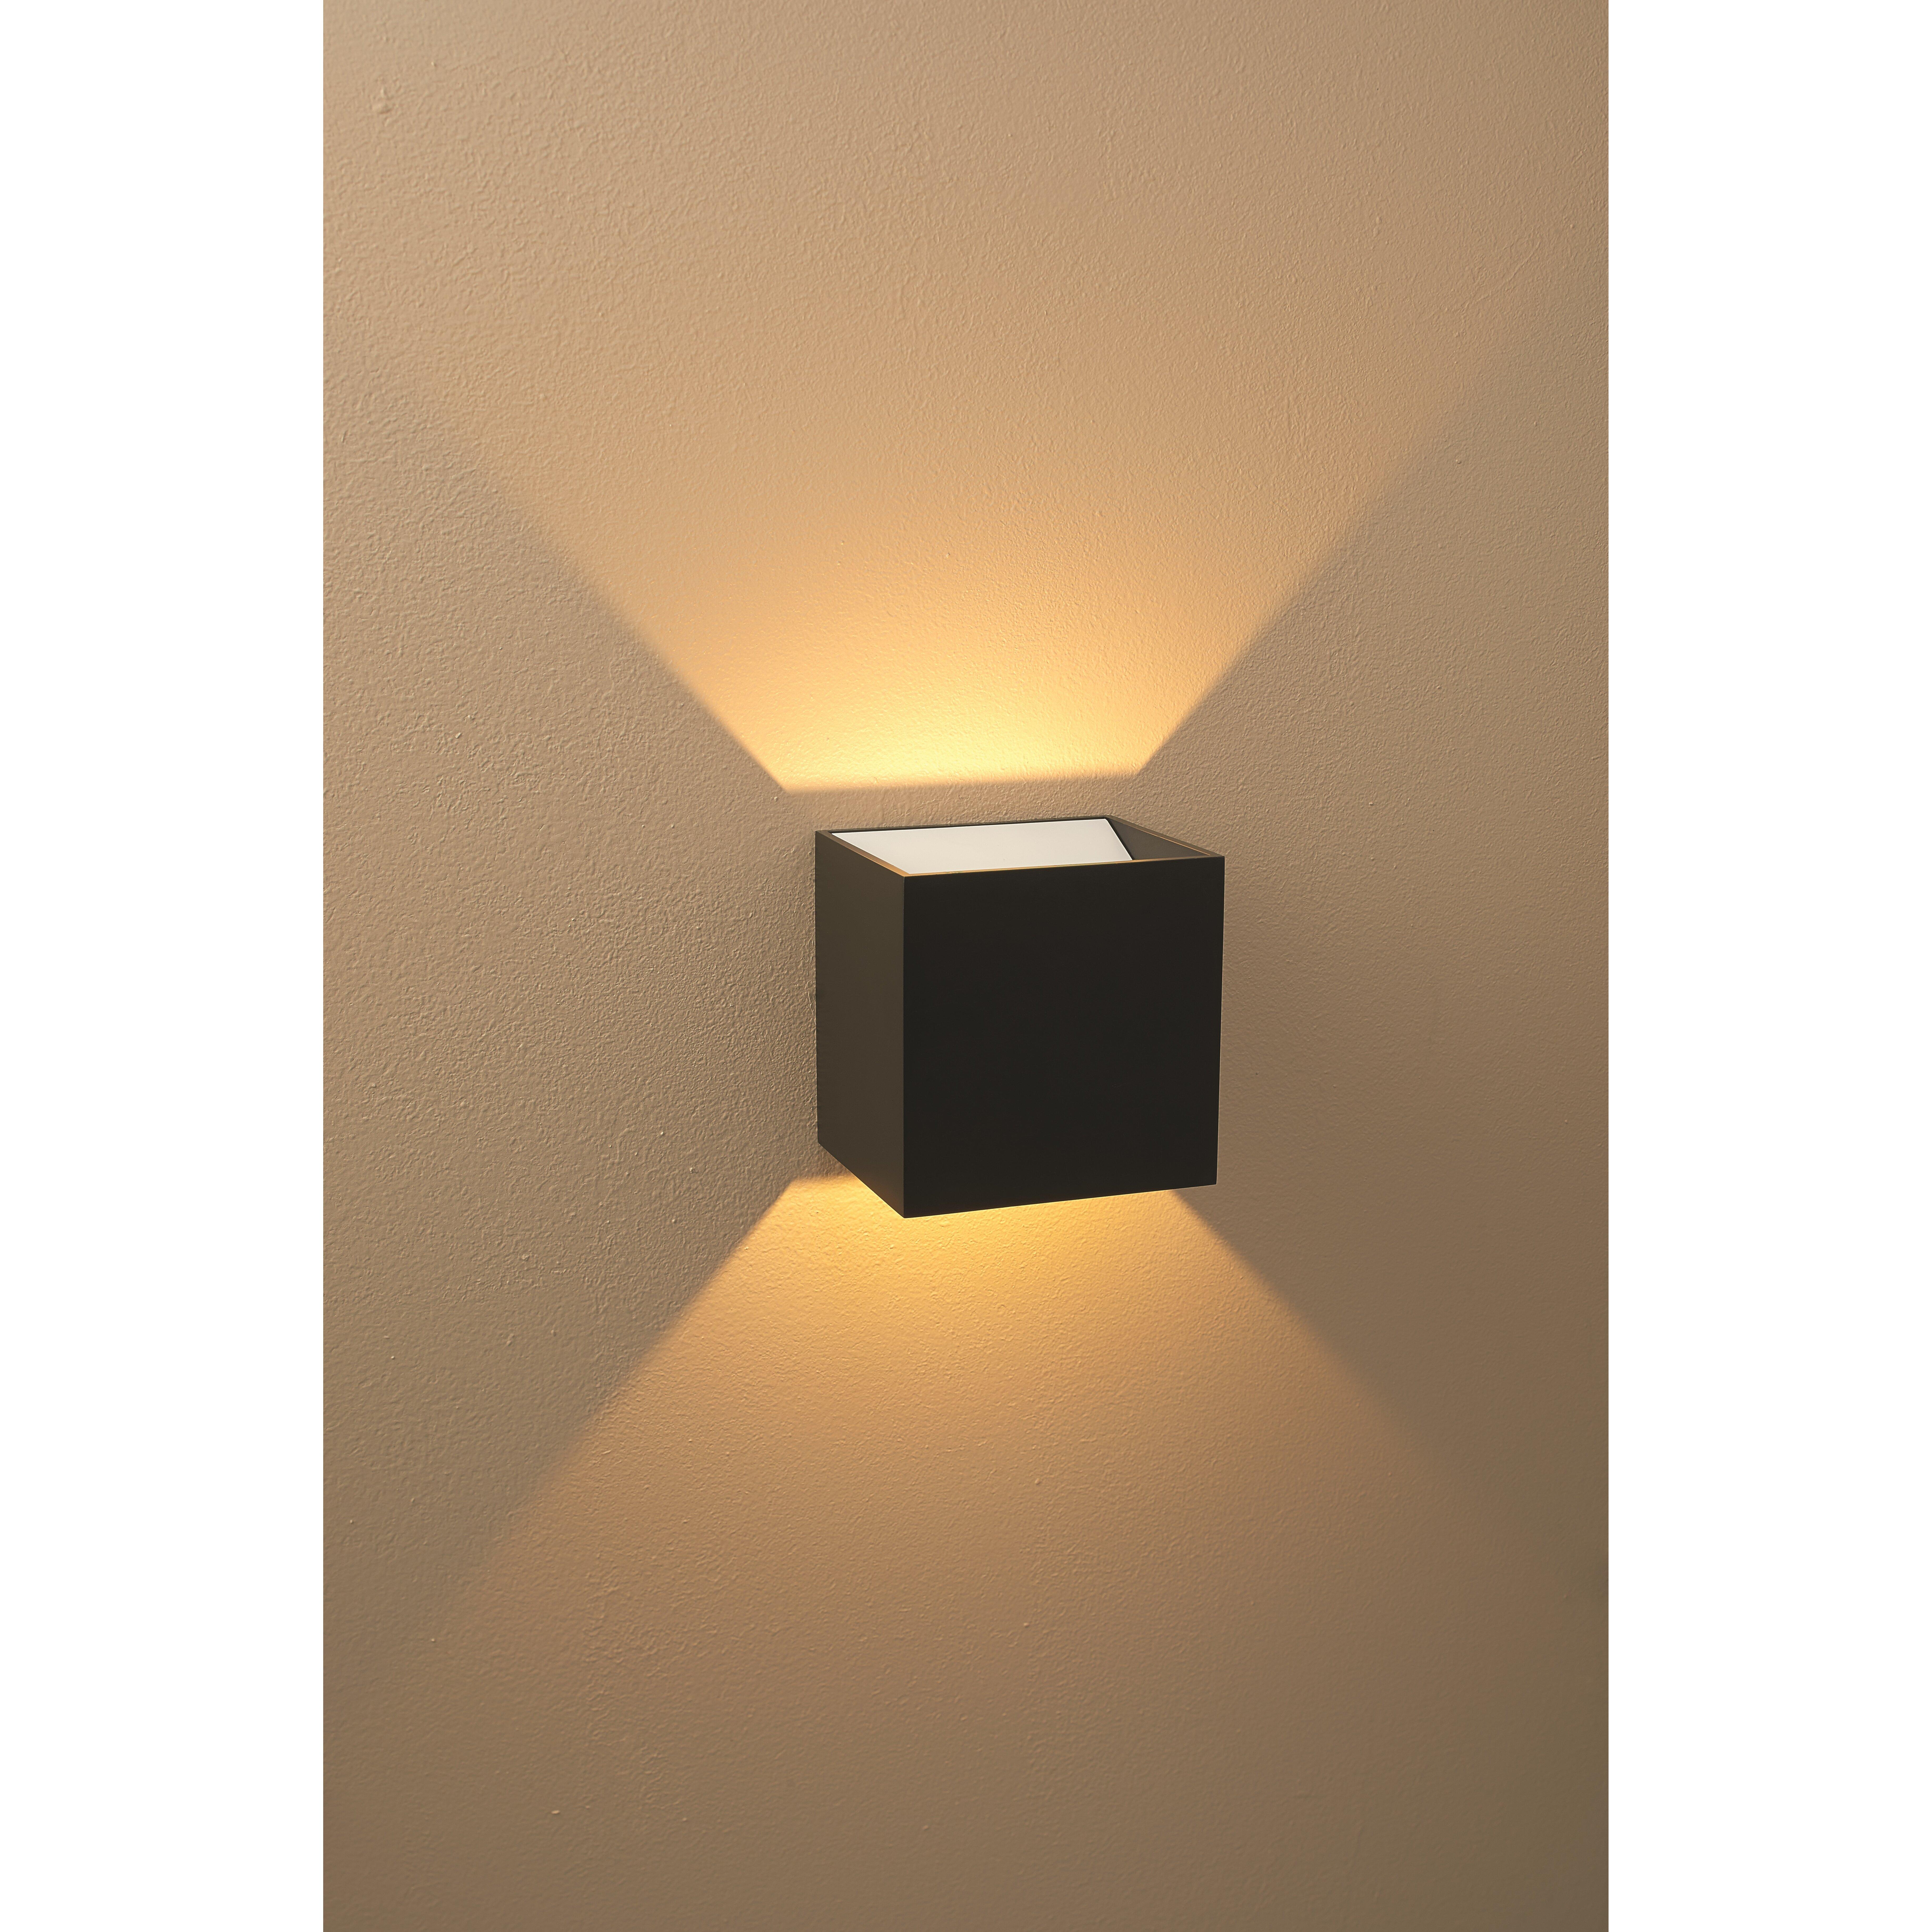 Wayfair supply lighting wall sconces bruck sku bbb2942